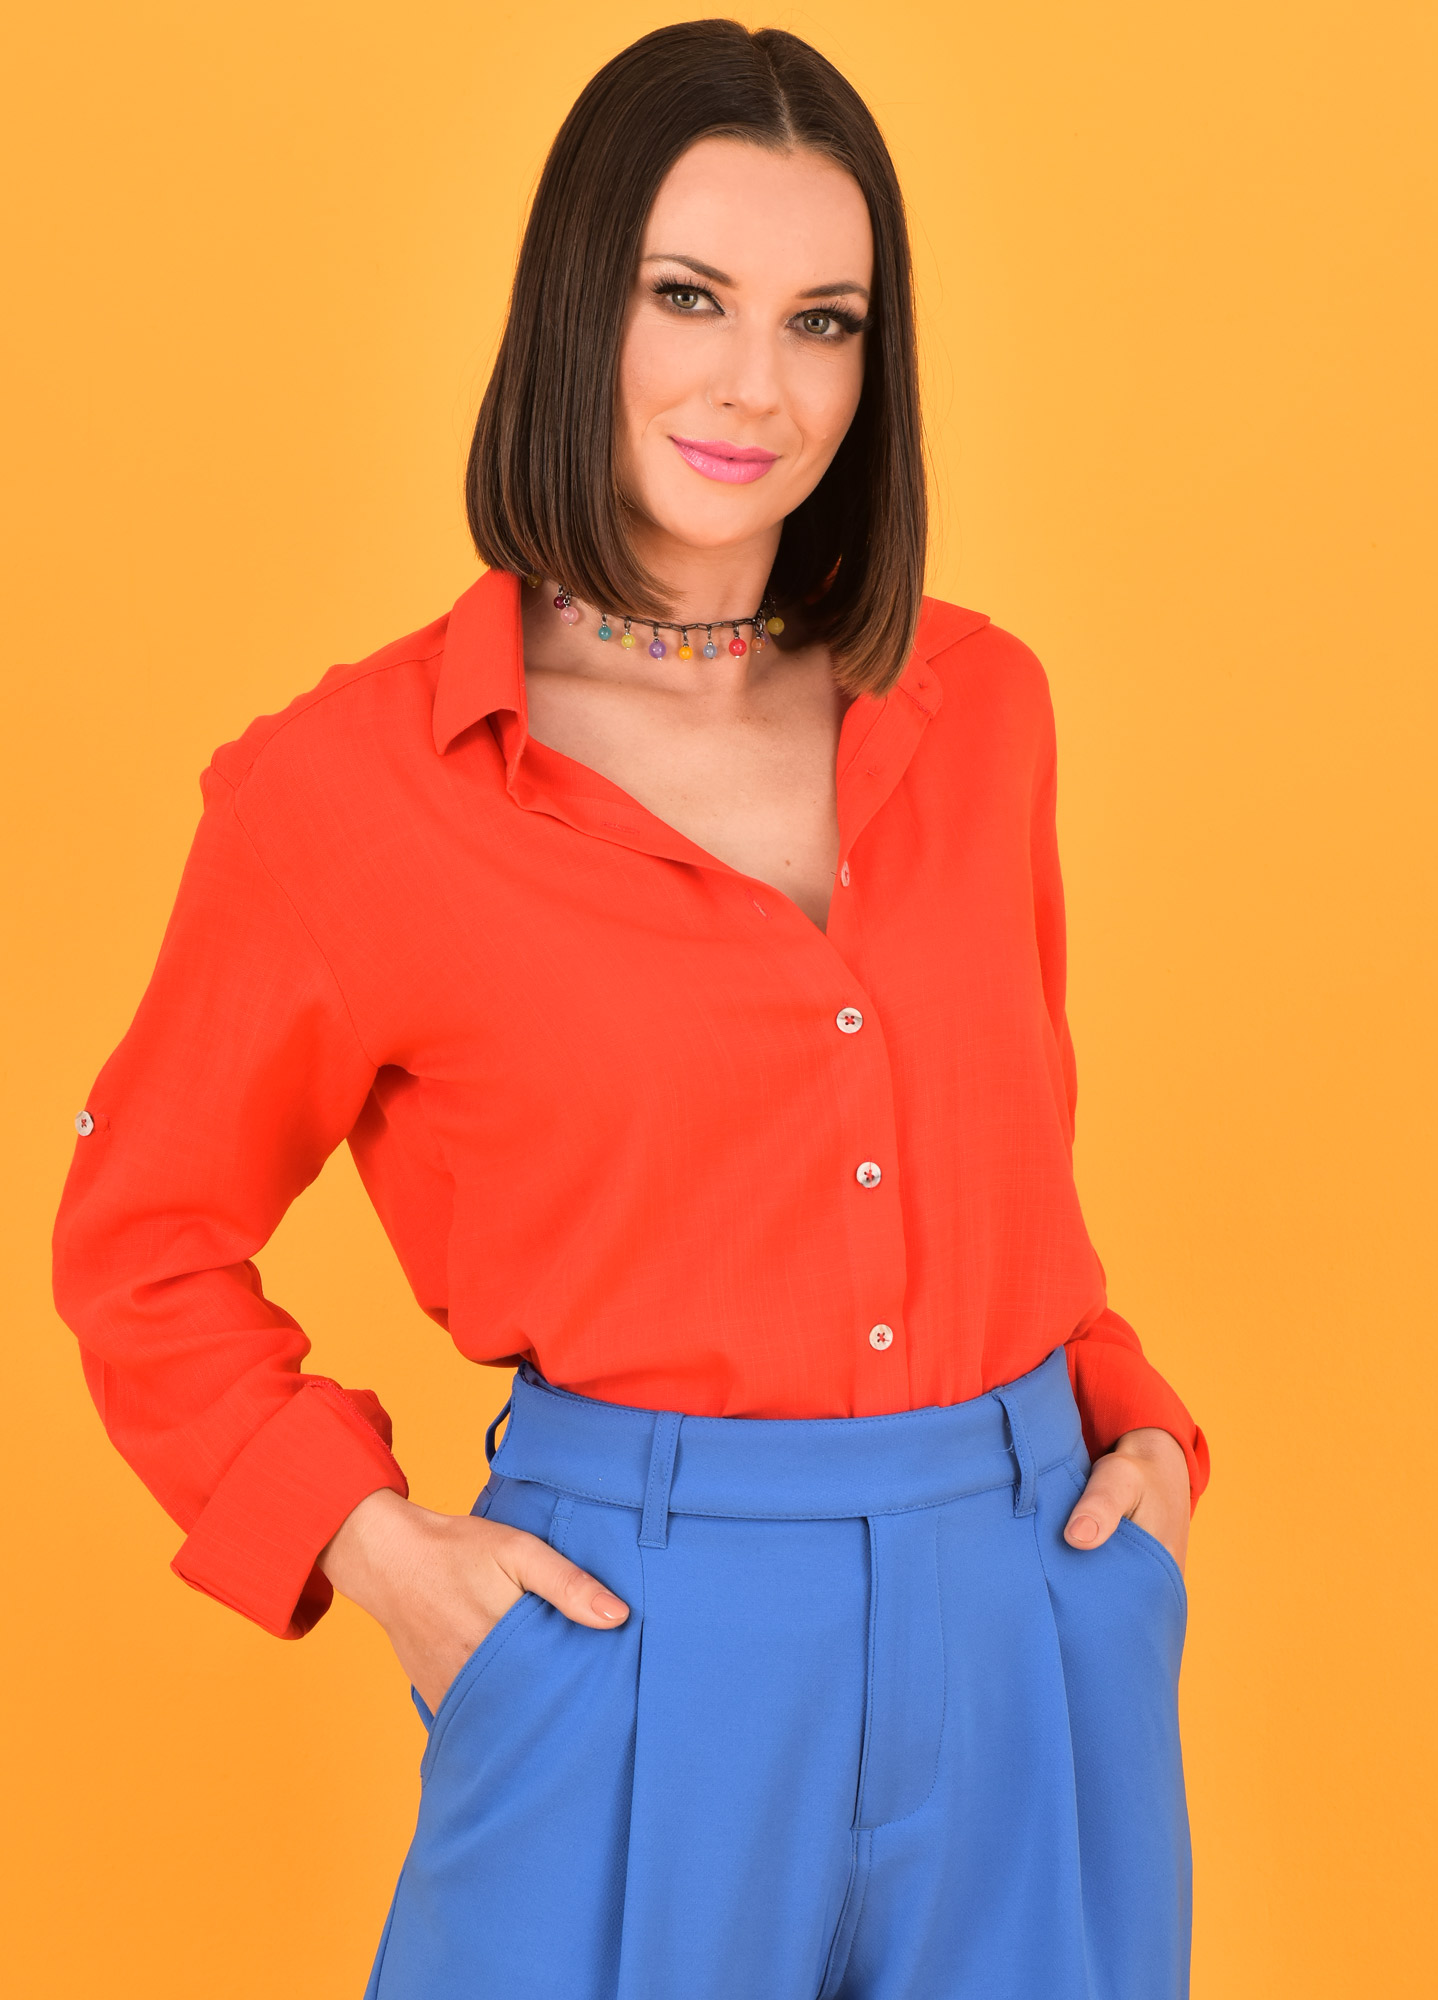 Camisa Oversized Feminina Viscolinho Vermelha